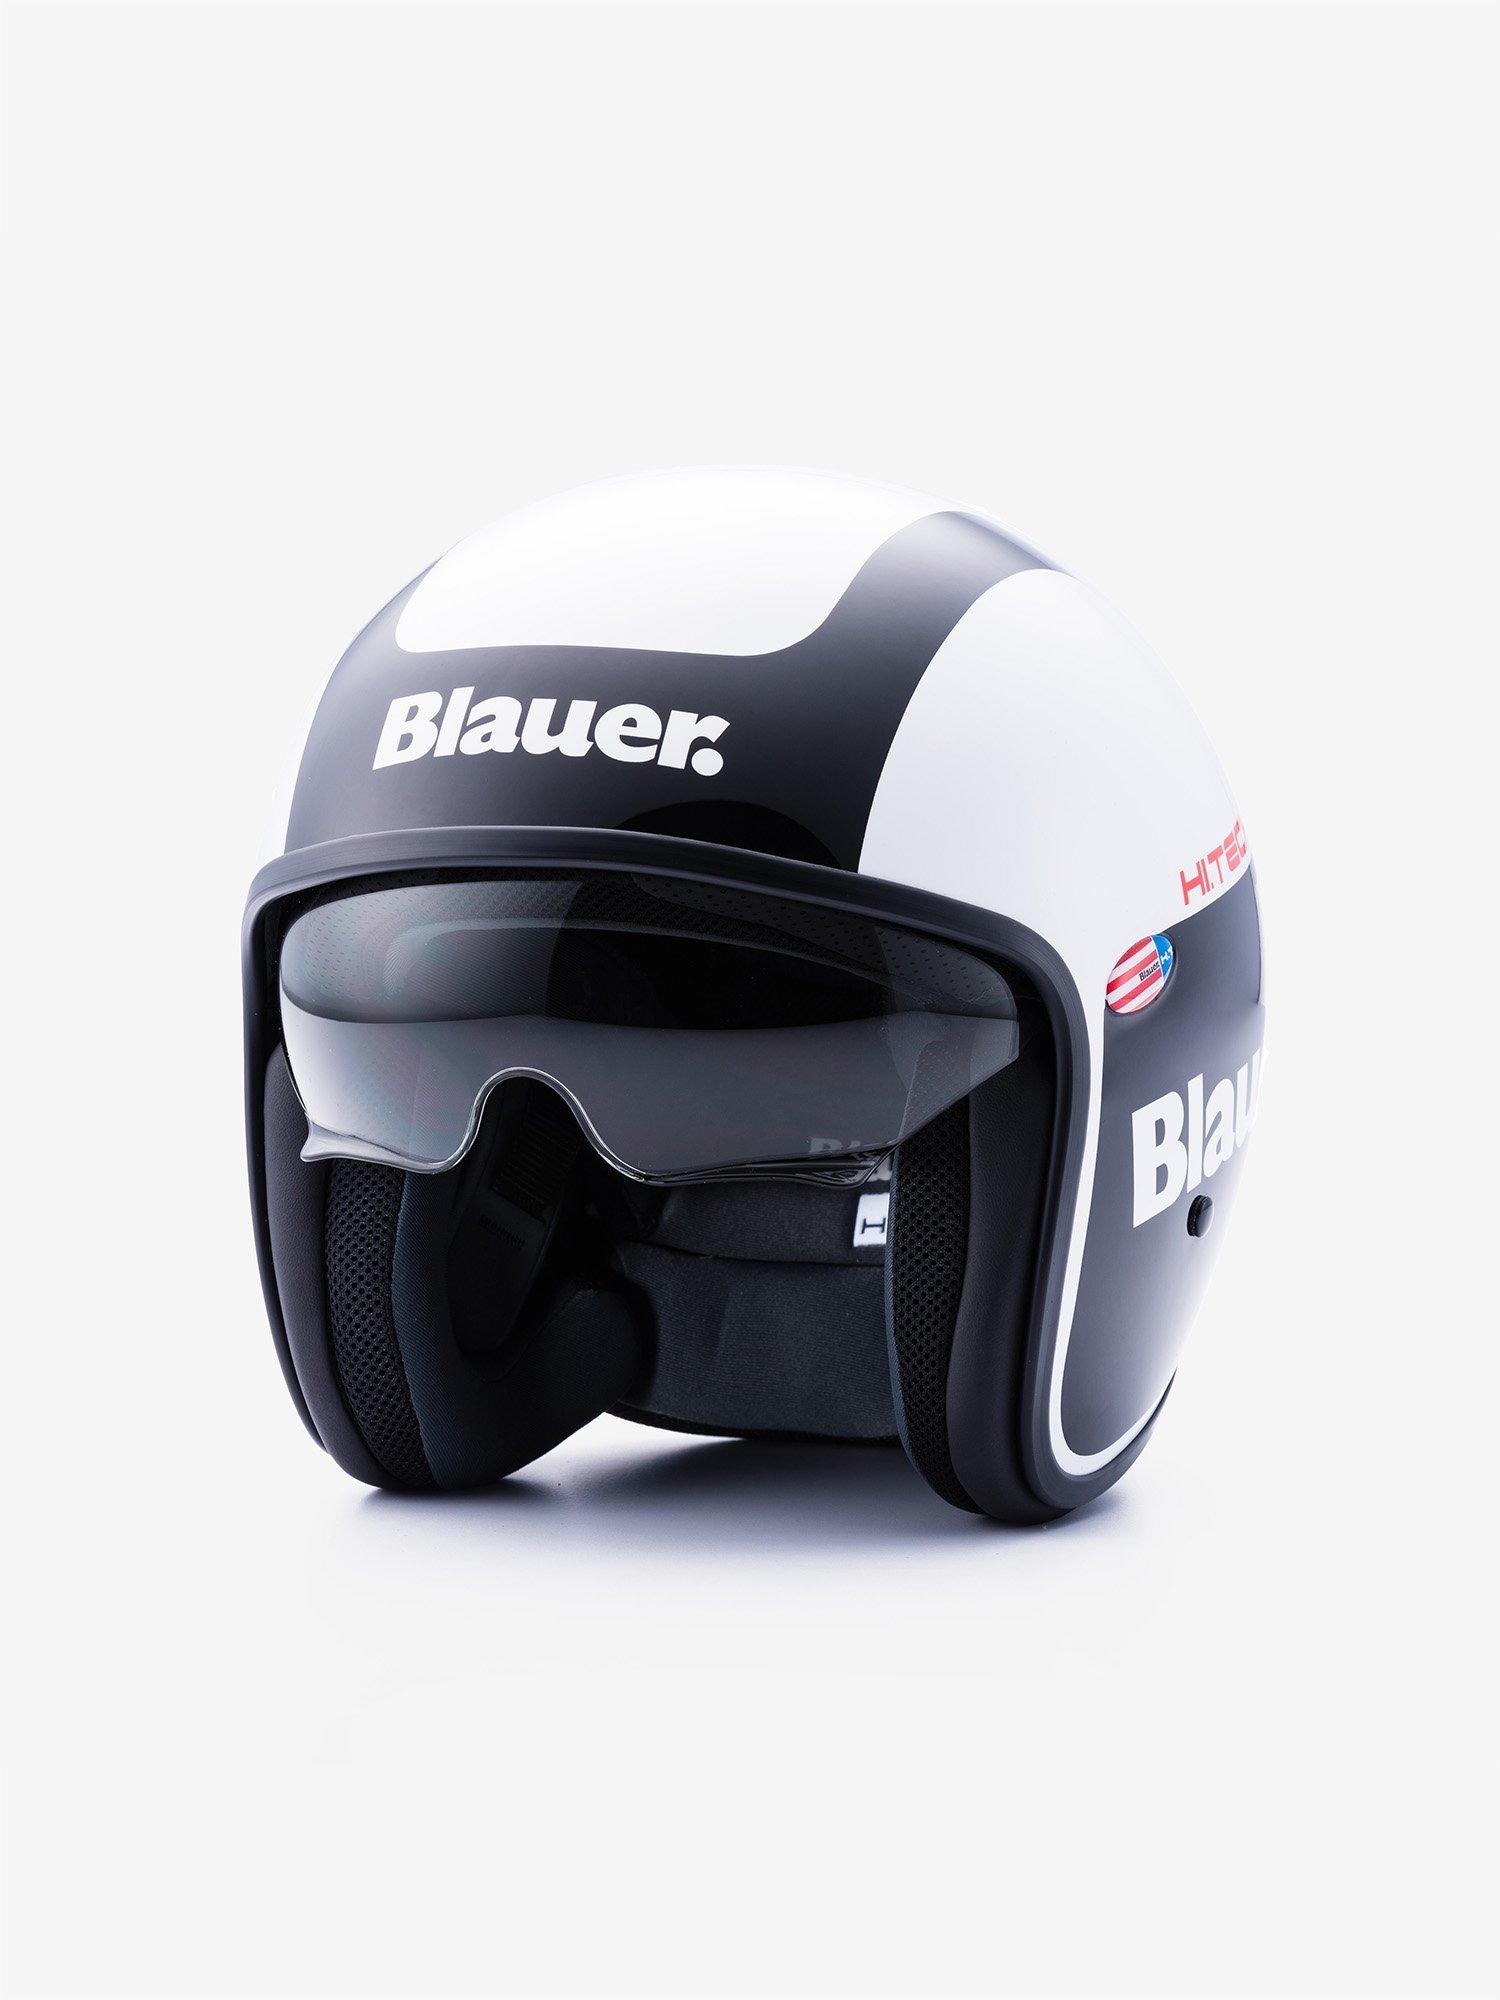 Blauer - PILOT 1.1 BICOLOR MATT - White / Black Glossy - Blauer